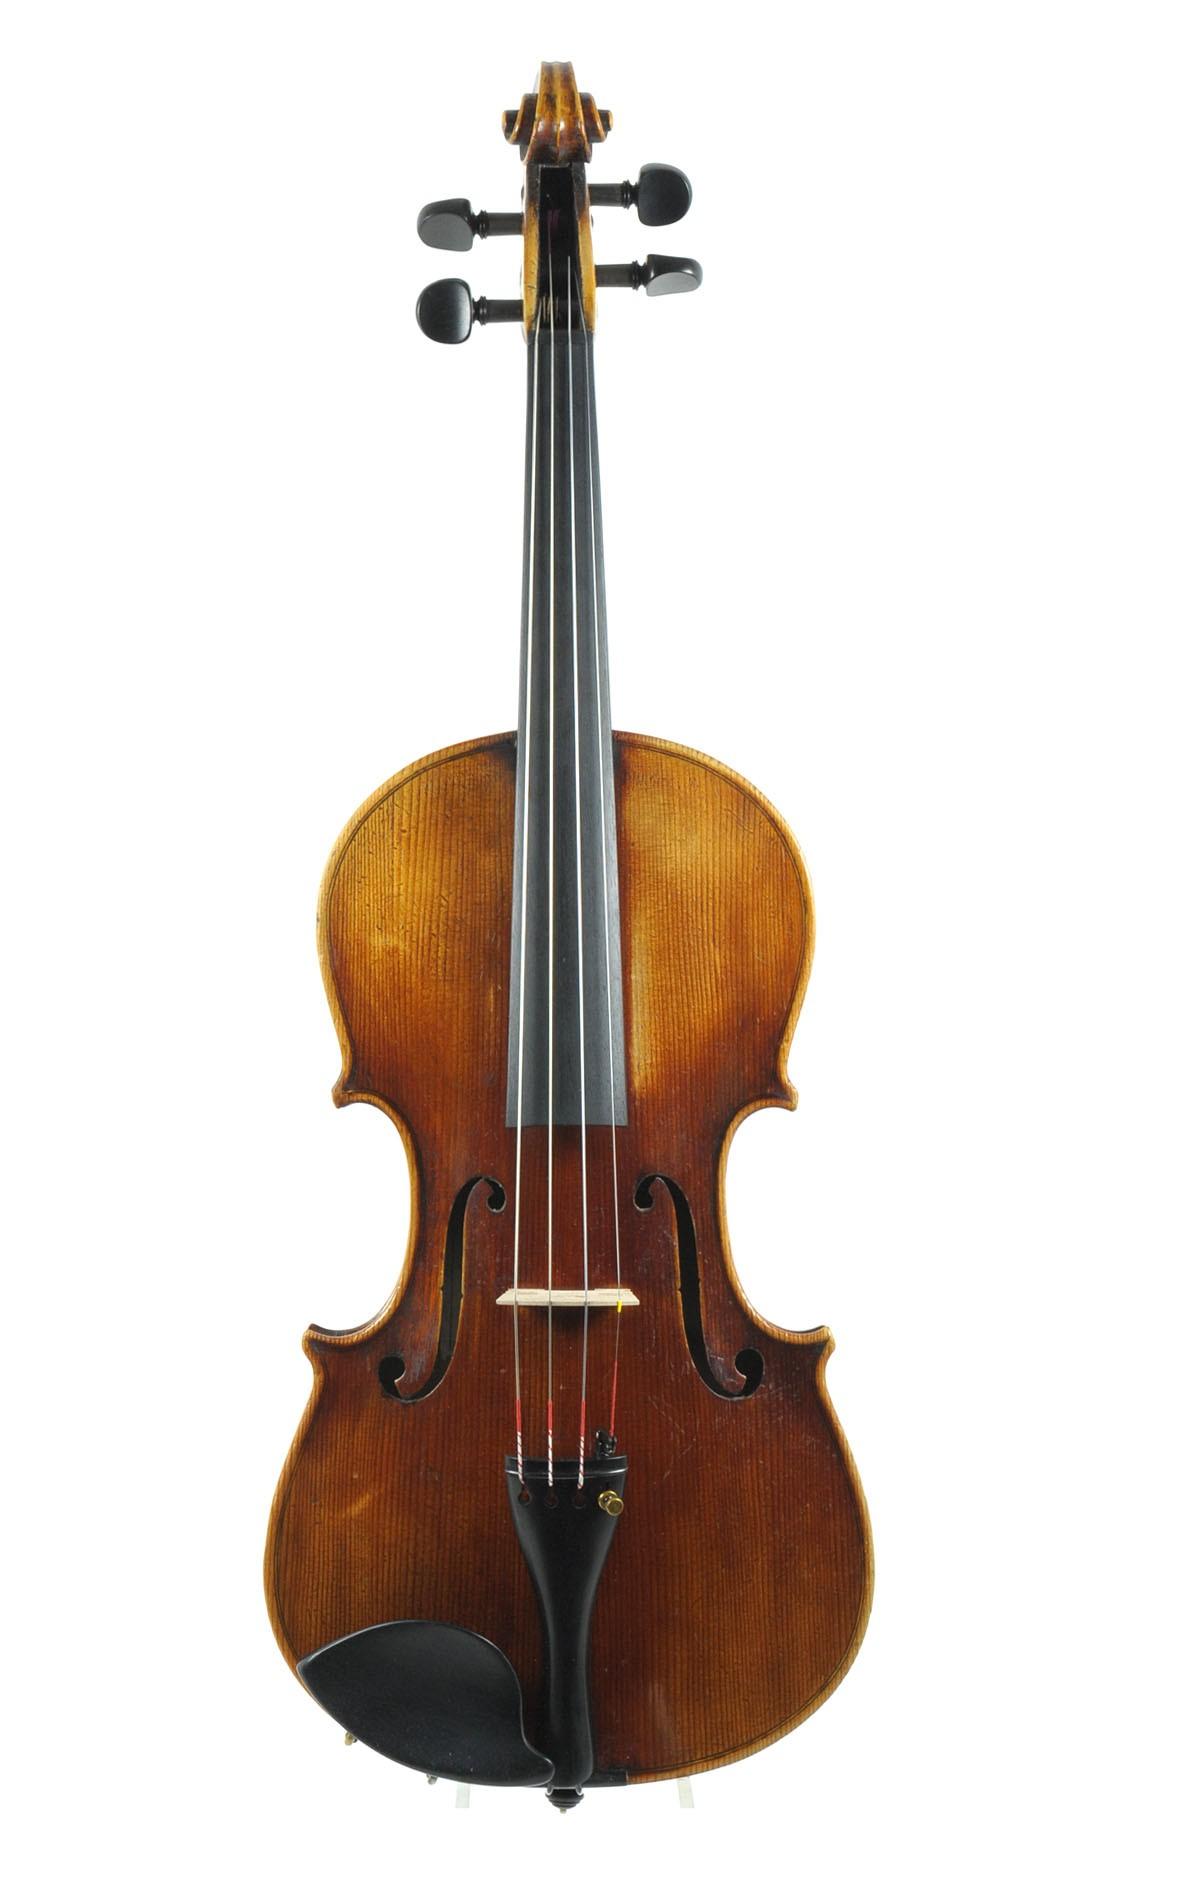 Franz Pfaff, Kaiserslautern Germany, violin approx. 1920 - table